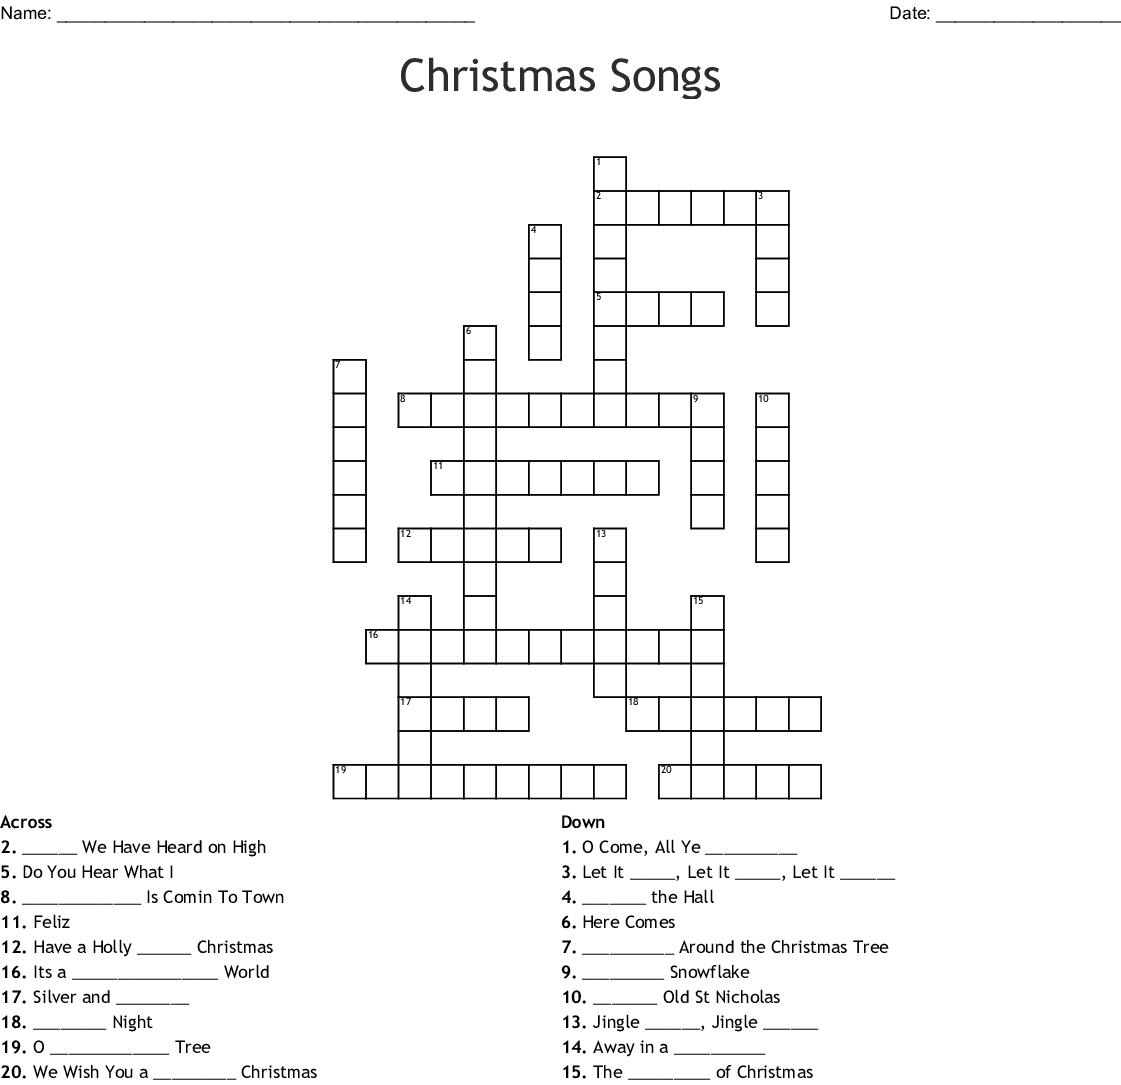 Christmas Carols Word Search